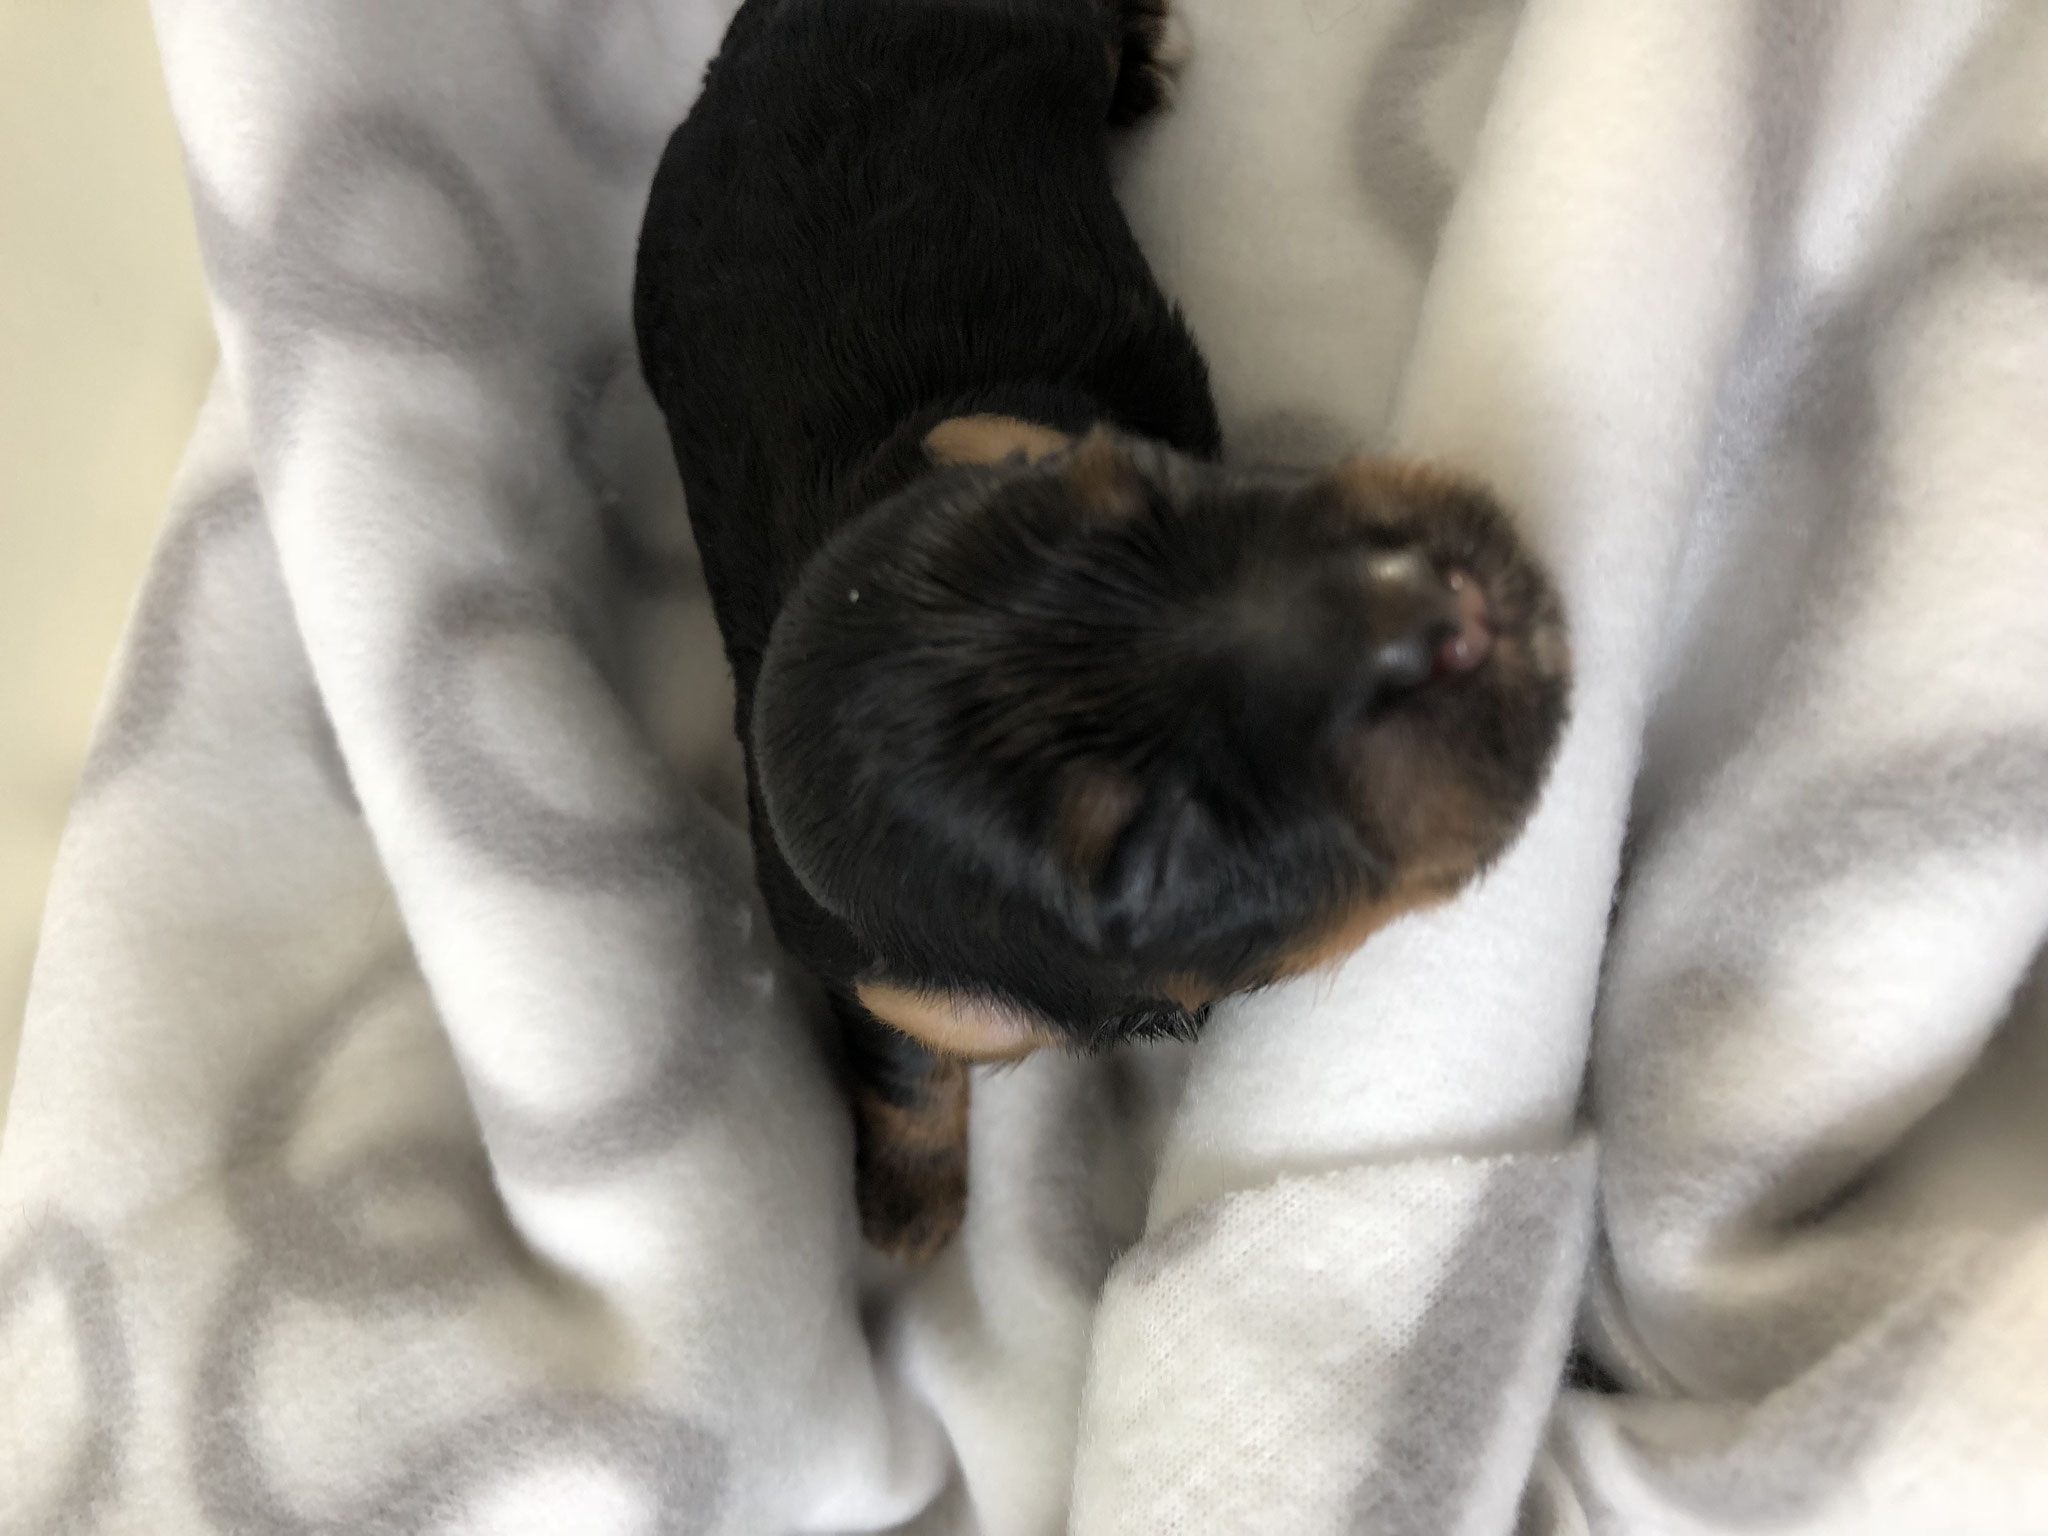 Unser Erstgeborener Zorro!